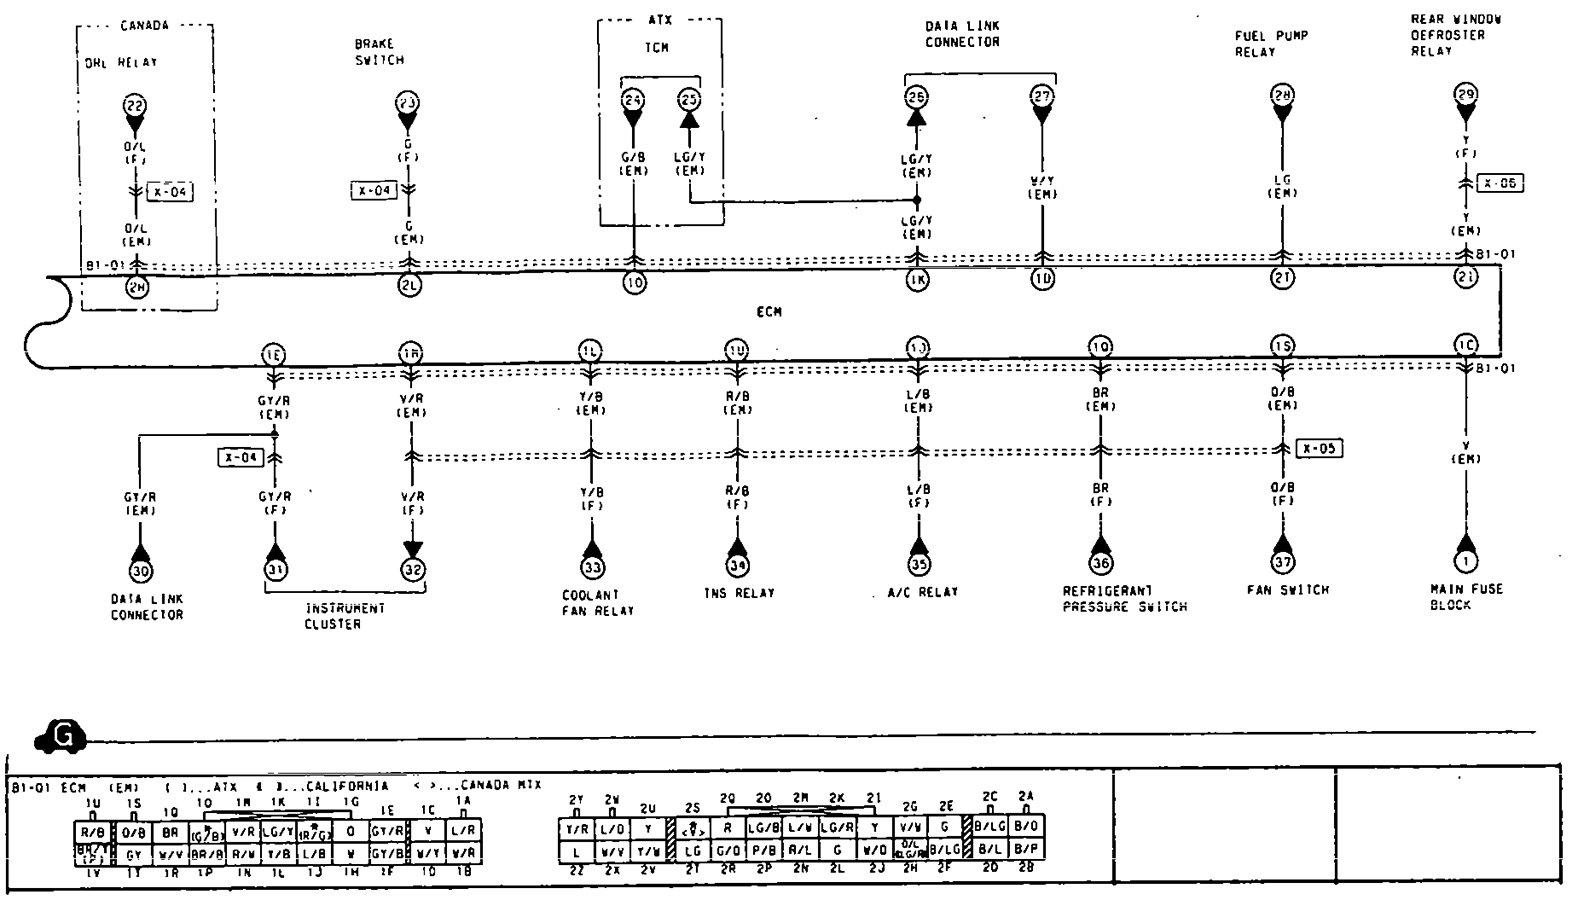 2000 mazda millenia vacuum diagram 2000 free engine image for user manual